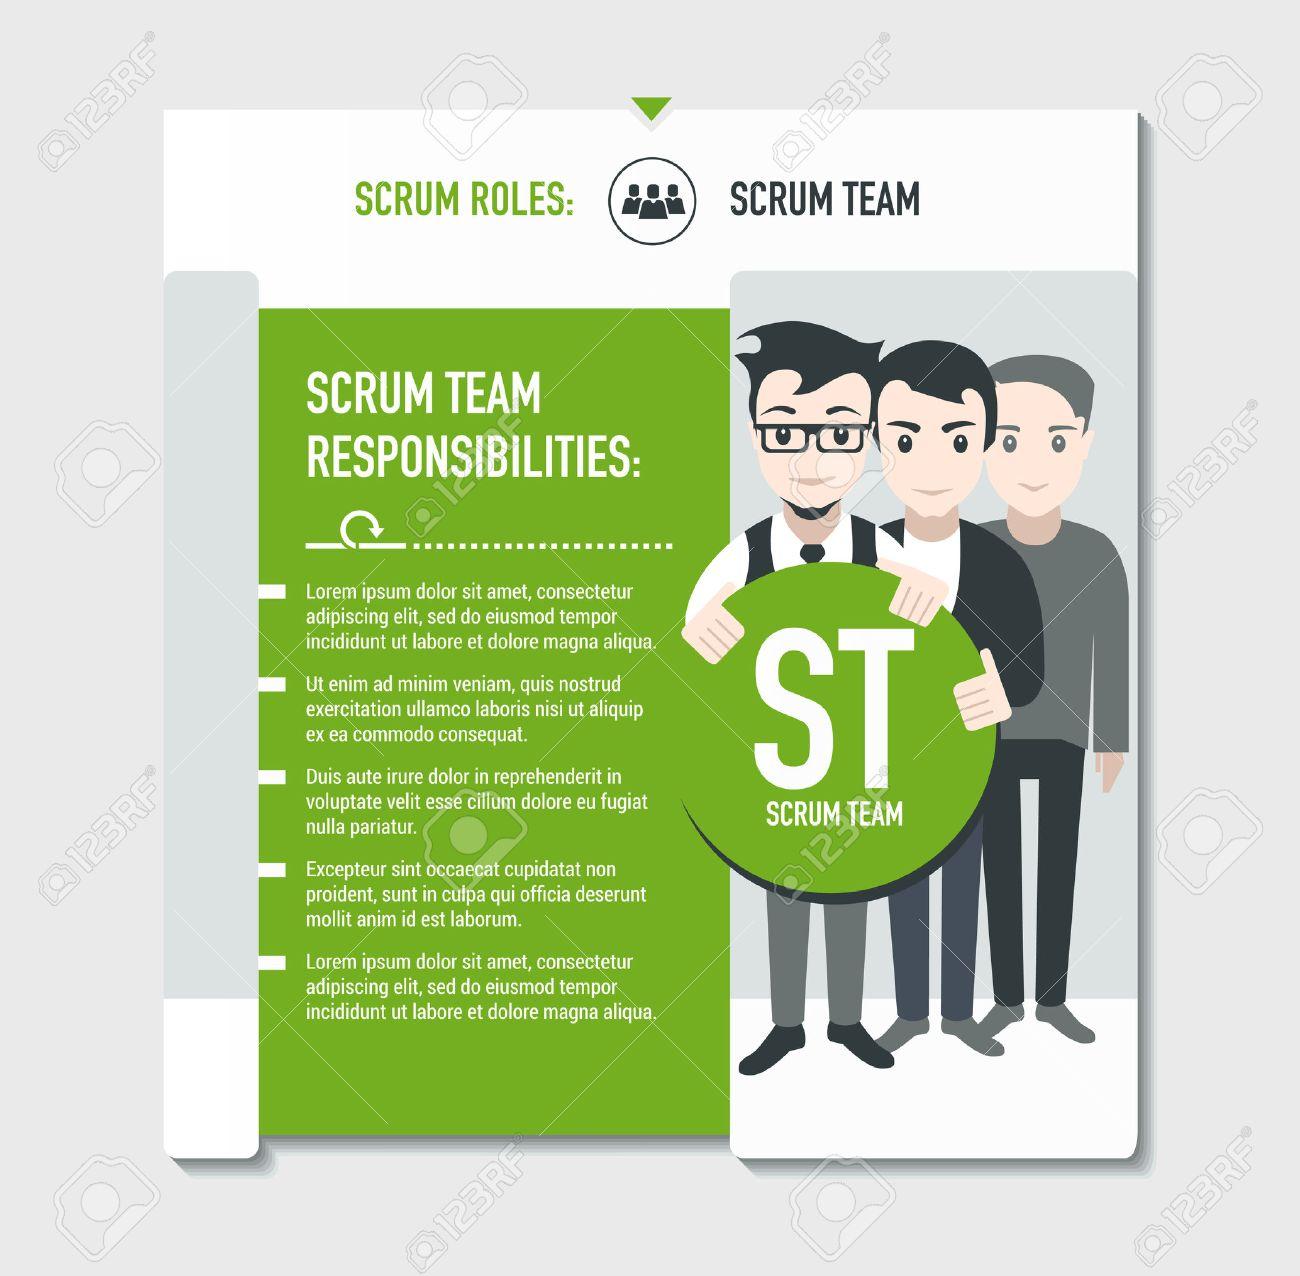 scrum roles scrum team responsibilities template in scrum